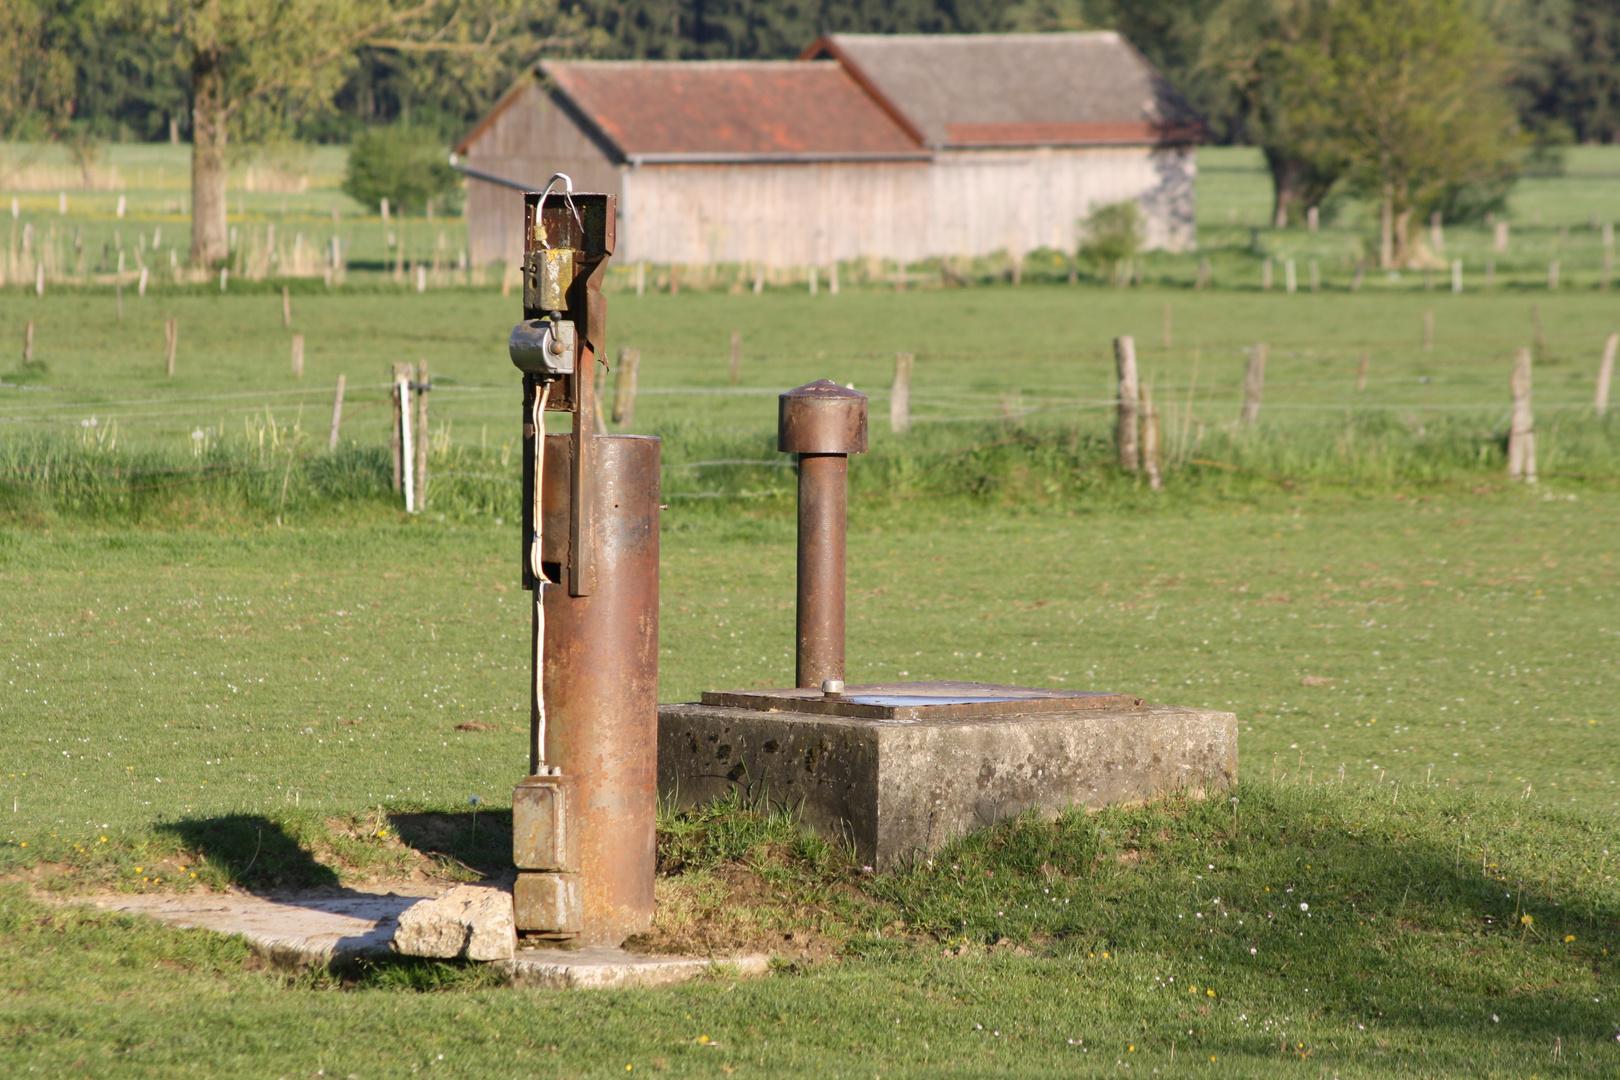 Landwirtschaft; Brunnen, Pumpe